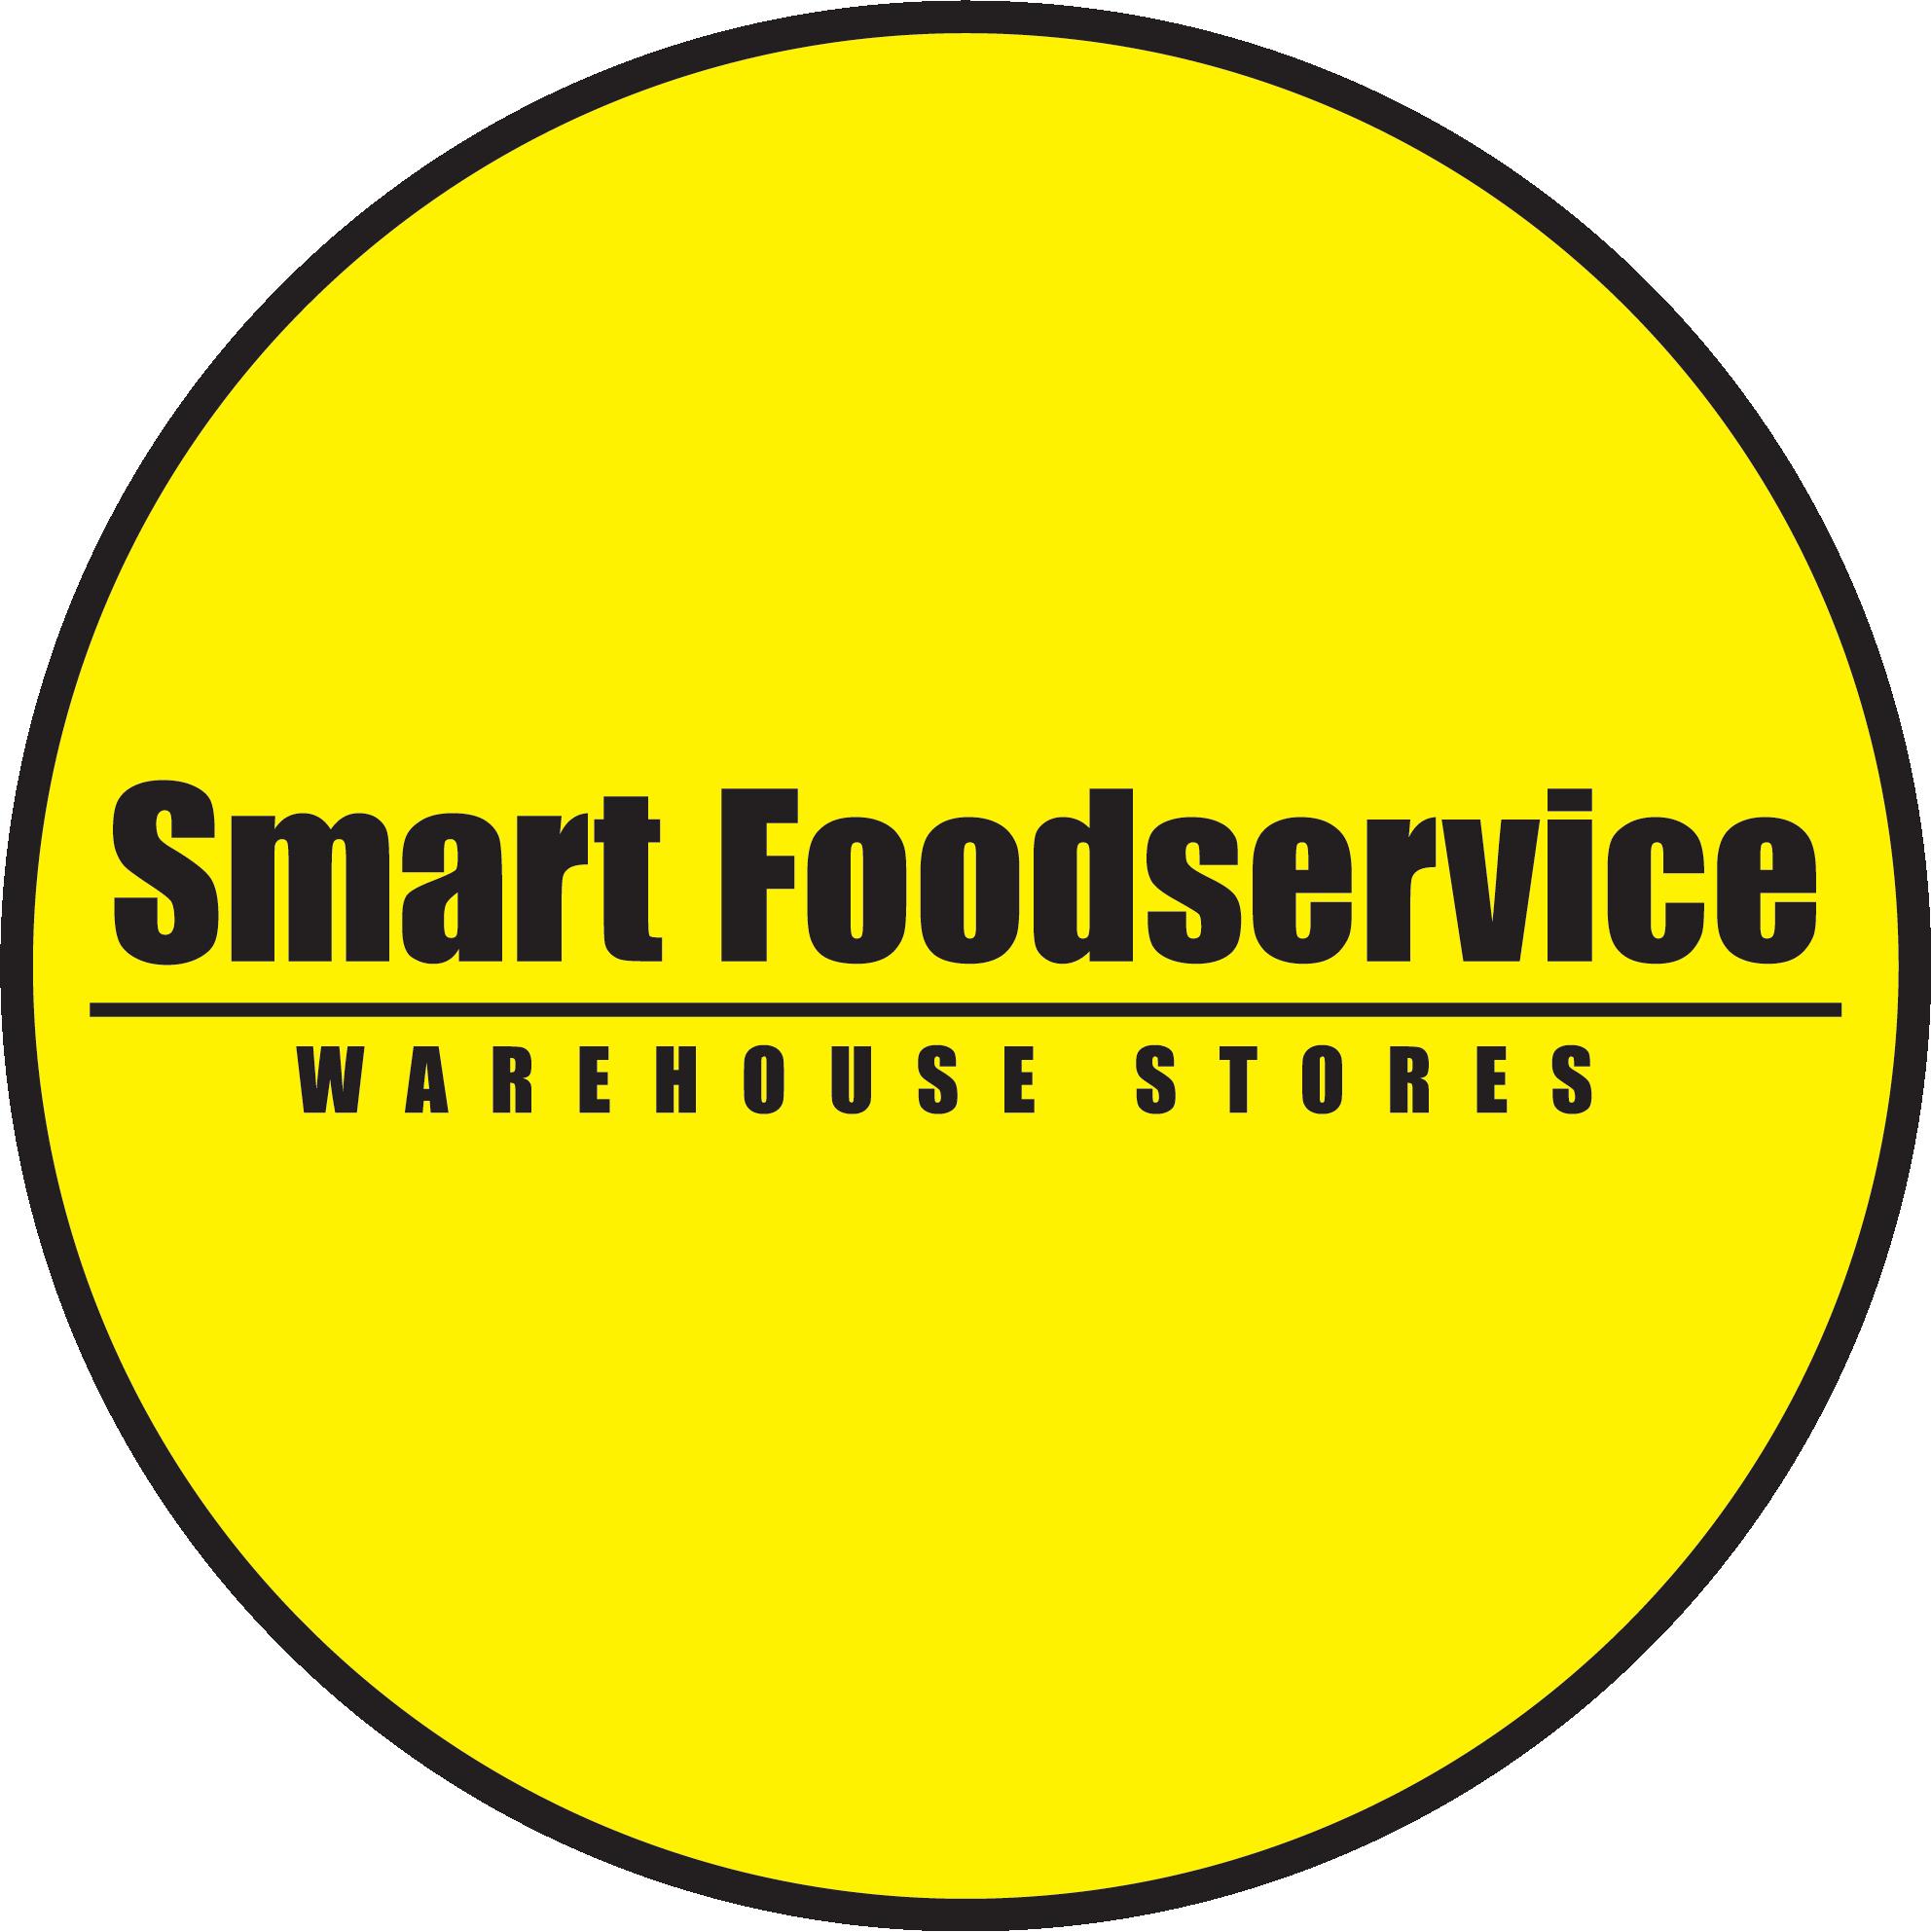 Smart Foodservice ®